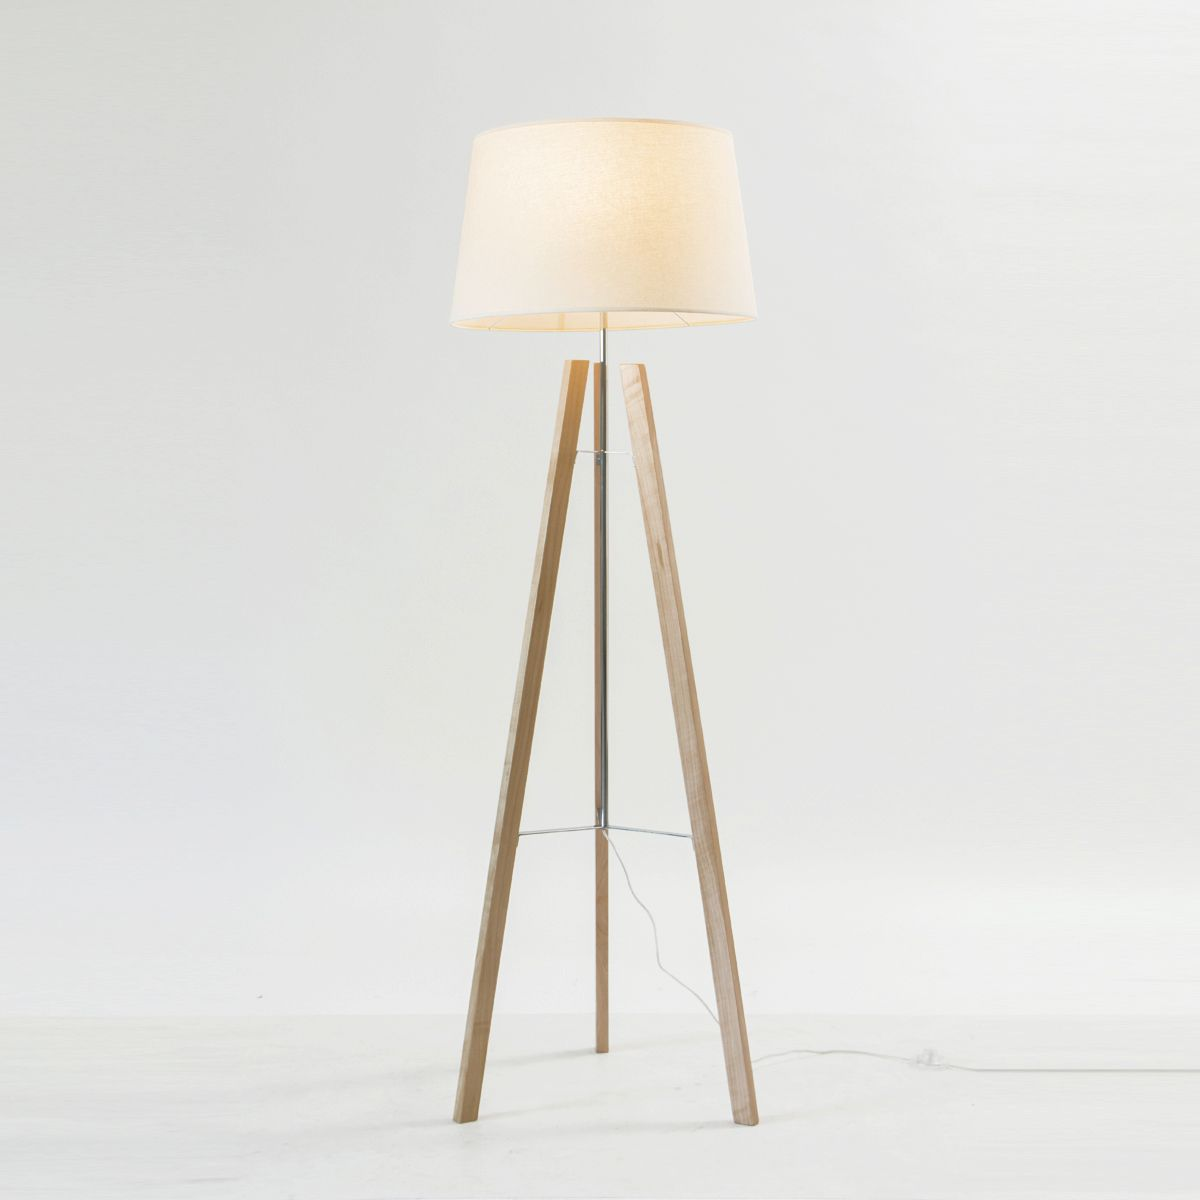 L mpara de pie lucas iluminaci n tienda iluminacion y - Iluminacion lamparas de pie ...